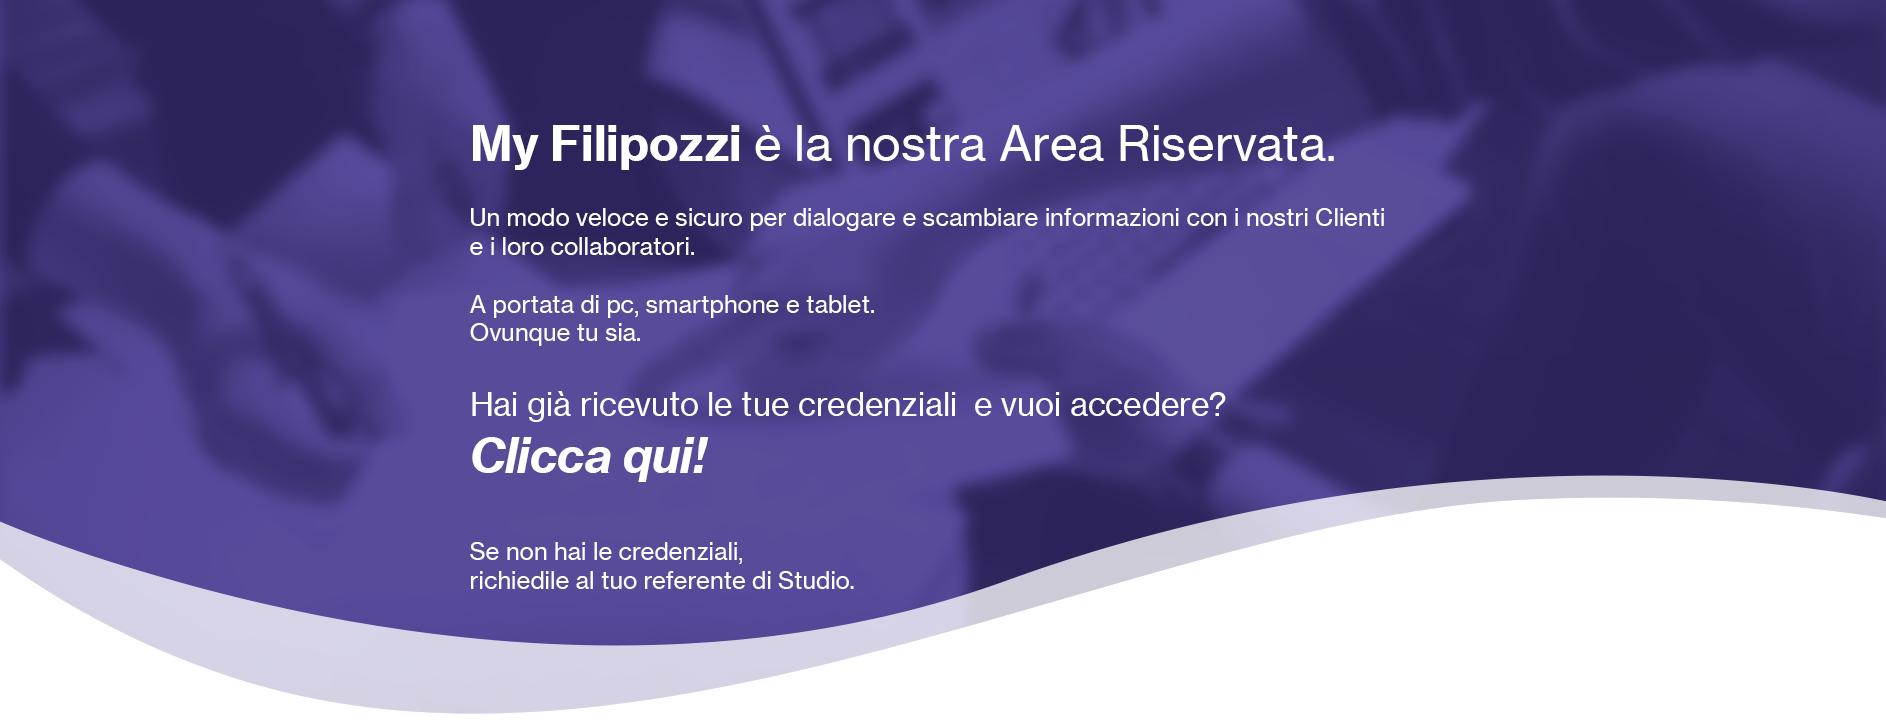 My Filipozzi - Area Riservata